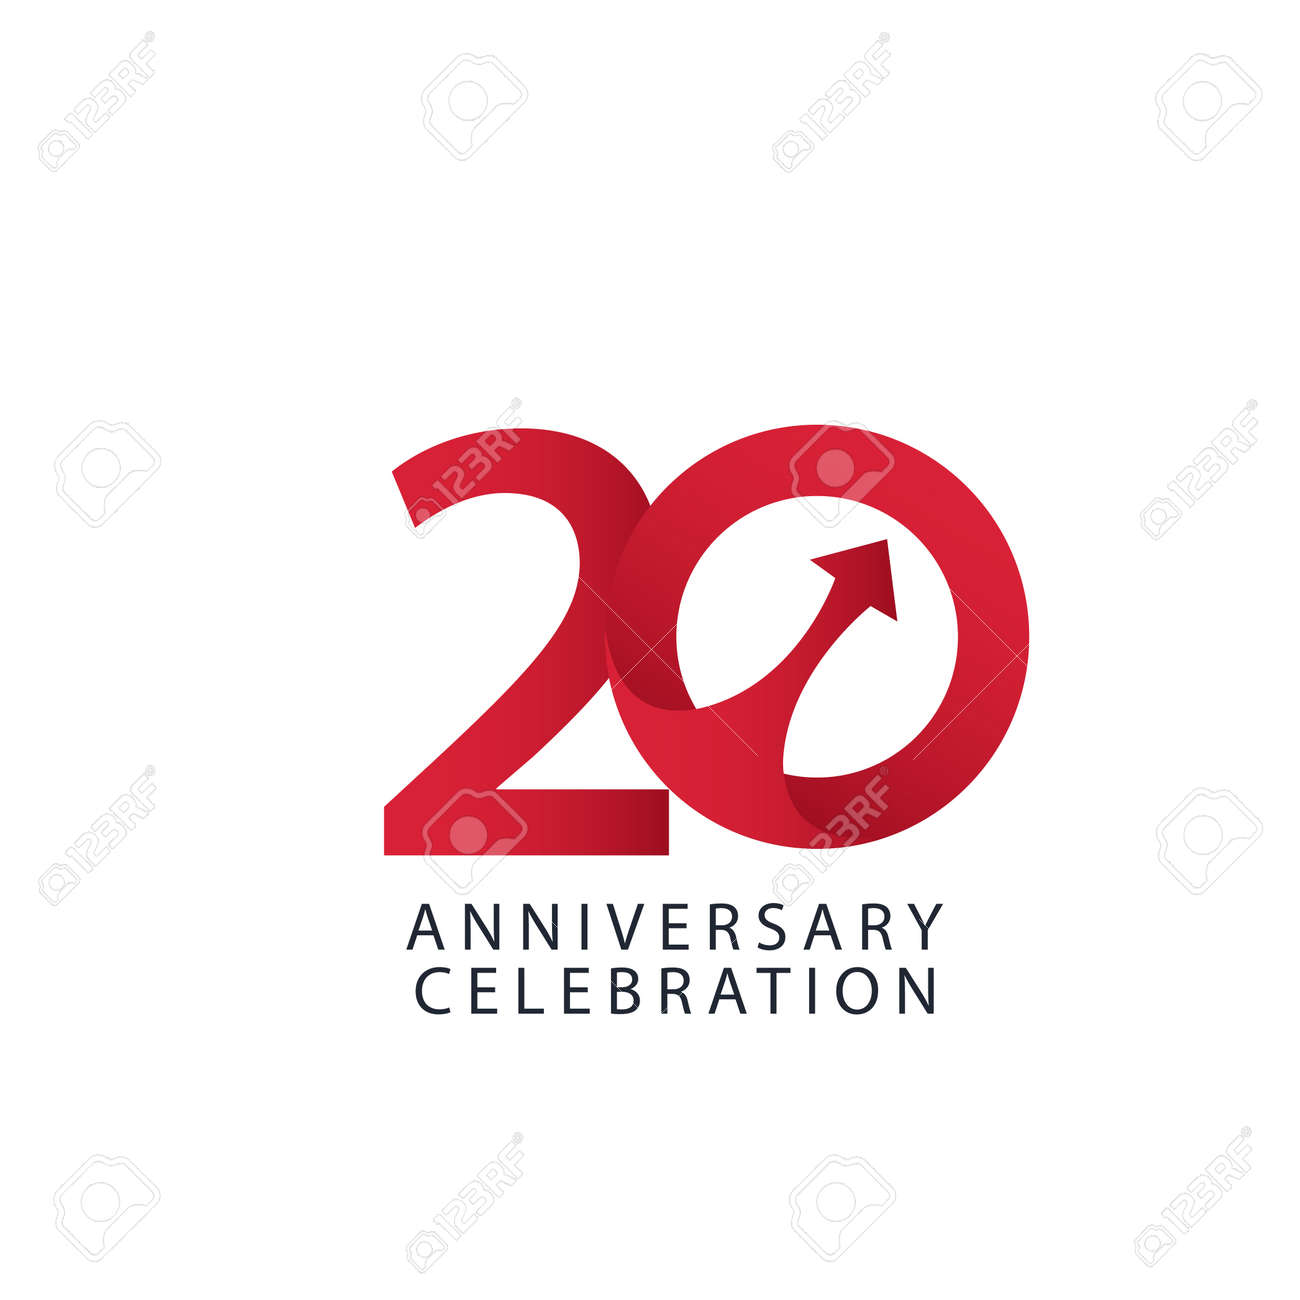 20 Years Anniversary Celebration Vector Template Design Illustration - 163698089